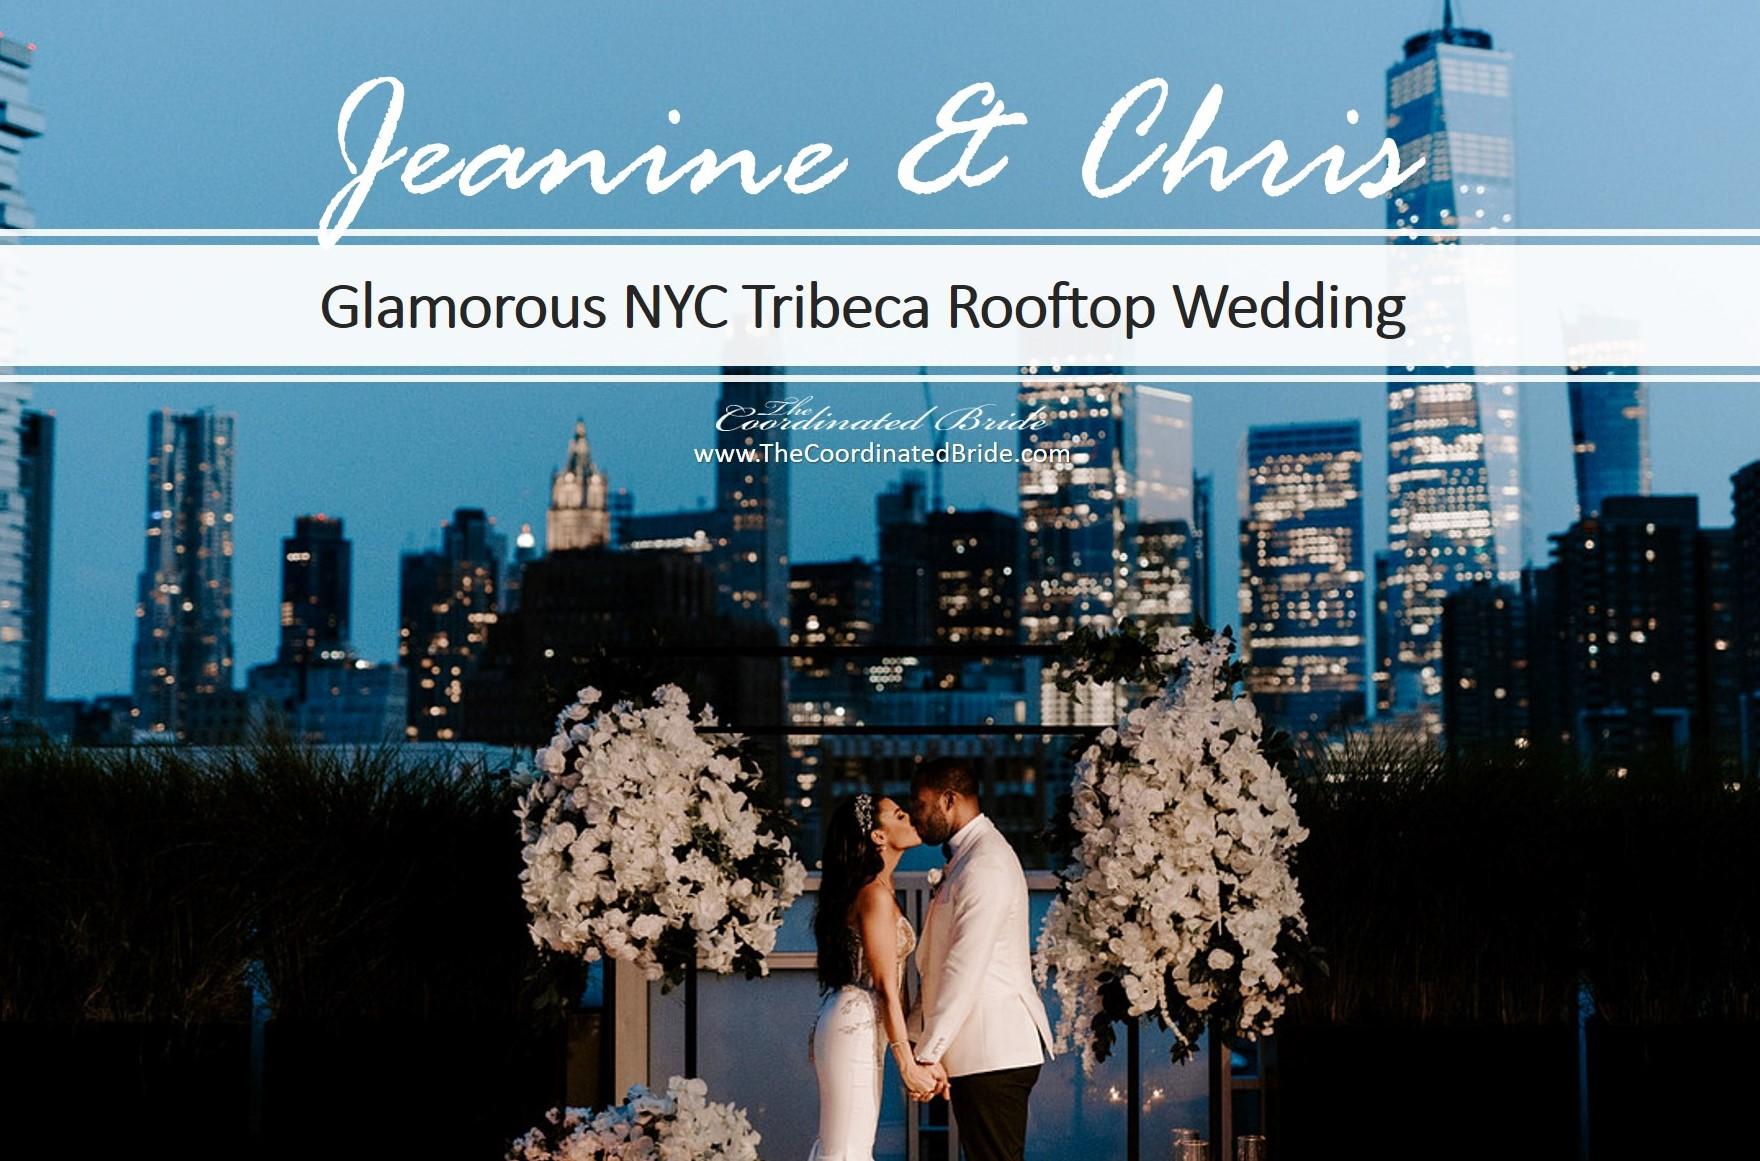 Glamorous New York City Wedding at Tribeca Rooftop, Jeanine & Chris